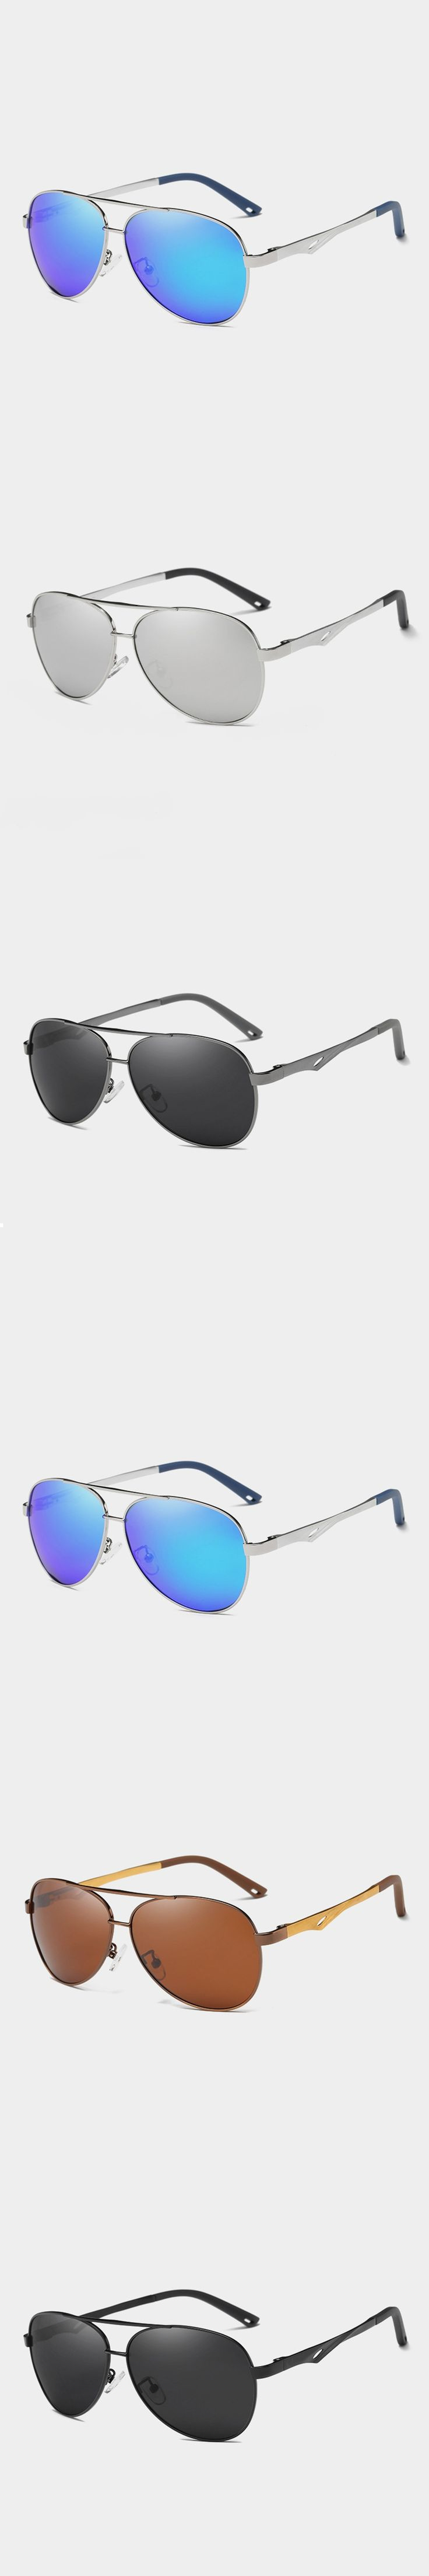 2018 OKULARY UV400 Pilot Yurt Sun Glasses Men Polarized Sunglasses Brand Logo Design Driving Glasses Goggles Oculos de sol 8532